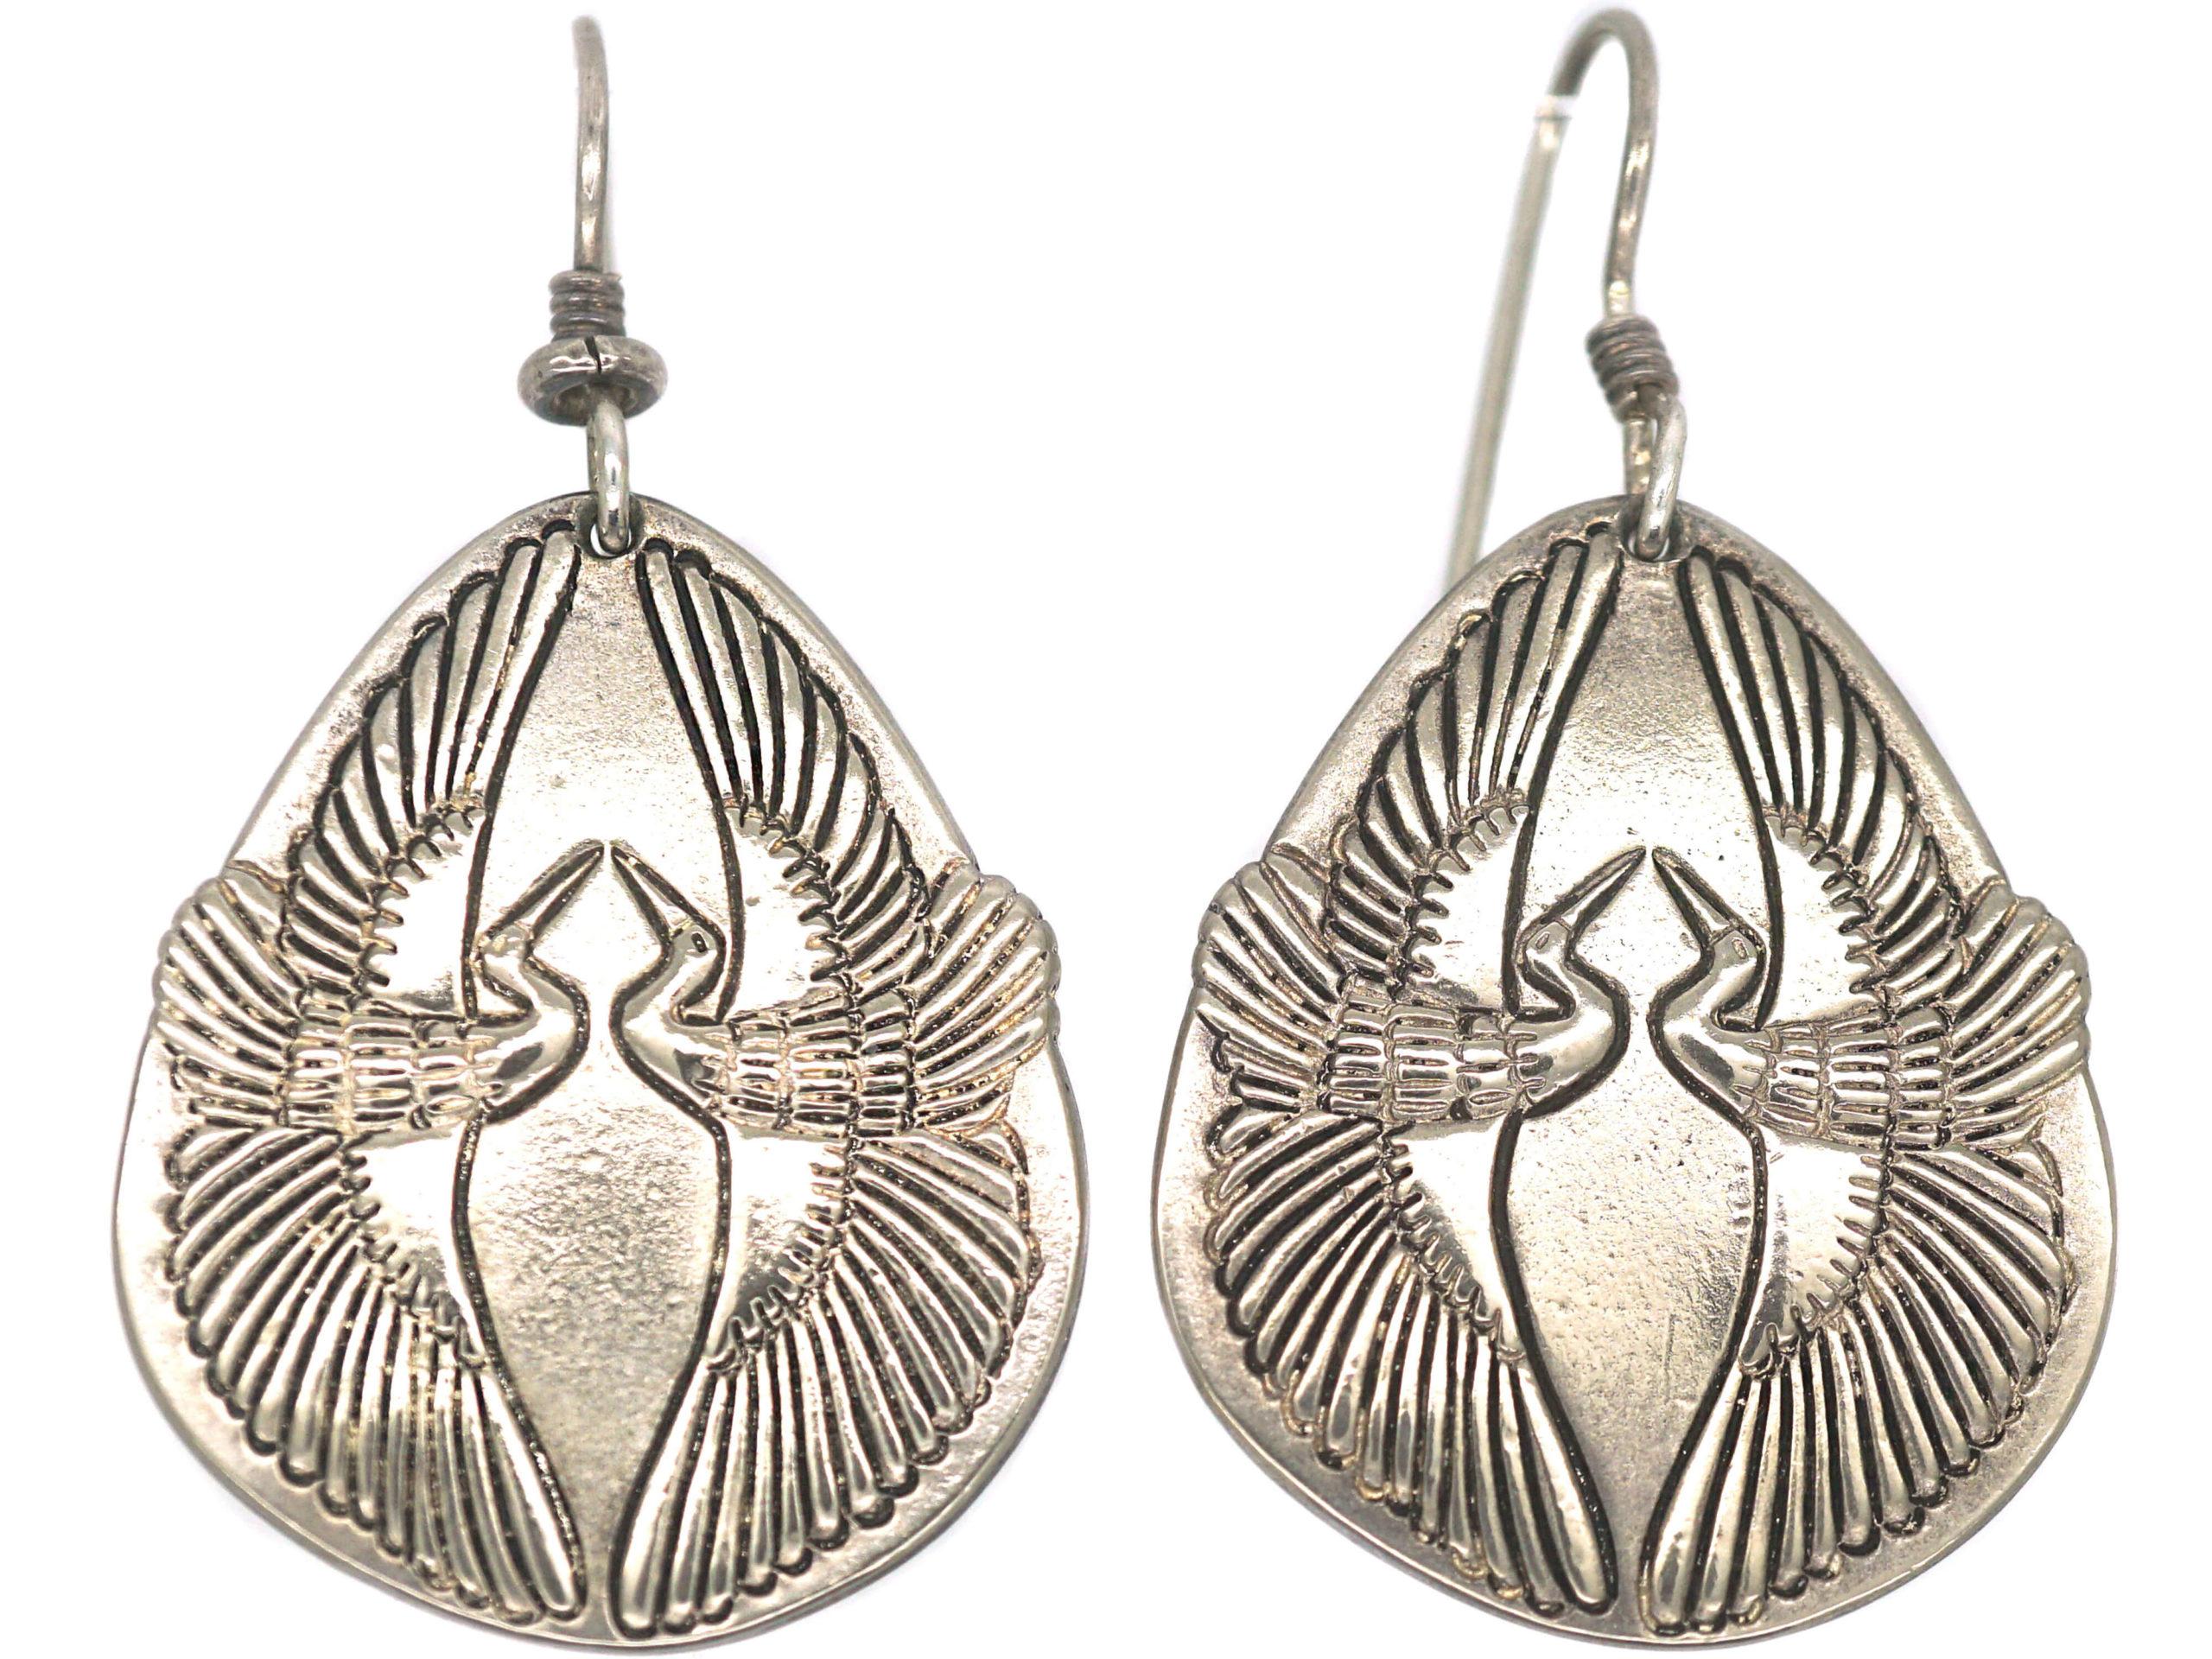 Vintage Silver Bird Earrings by Laurel Burch